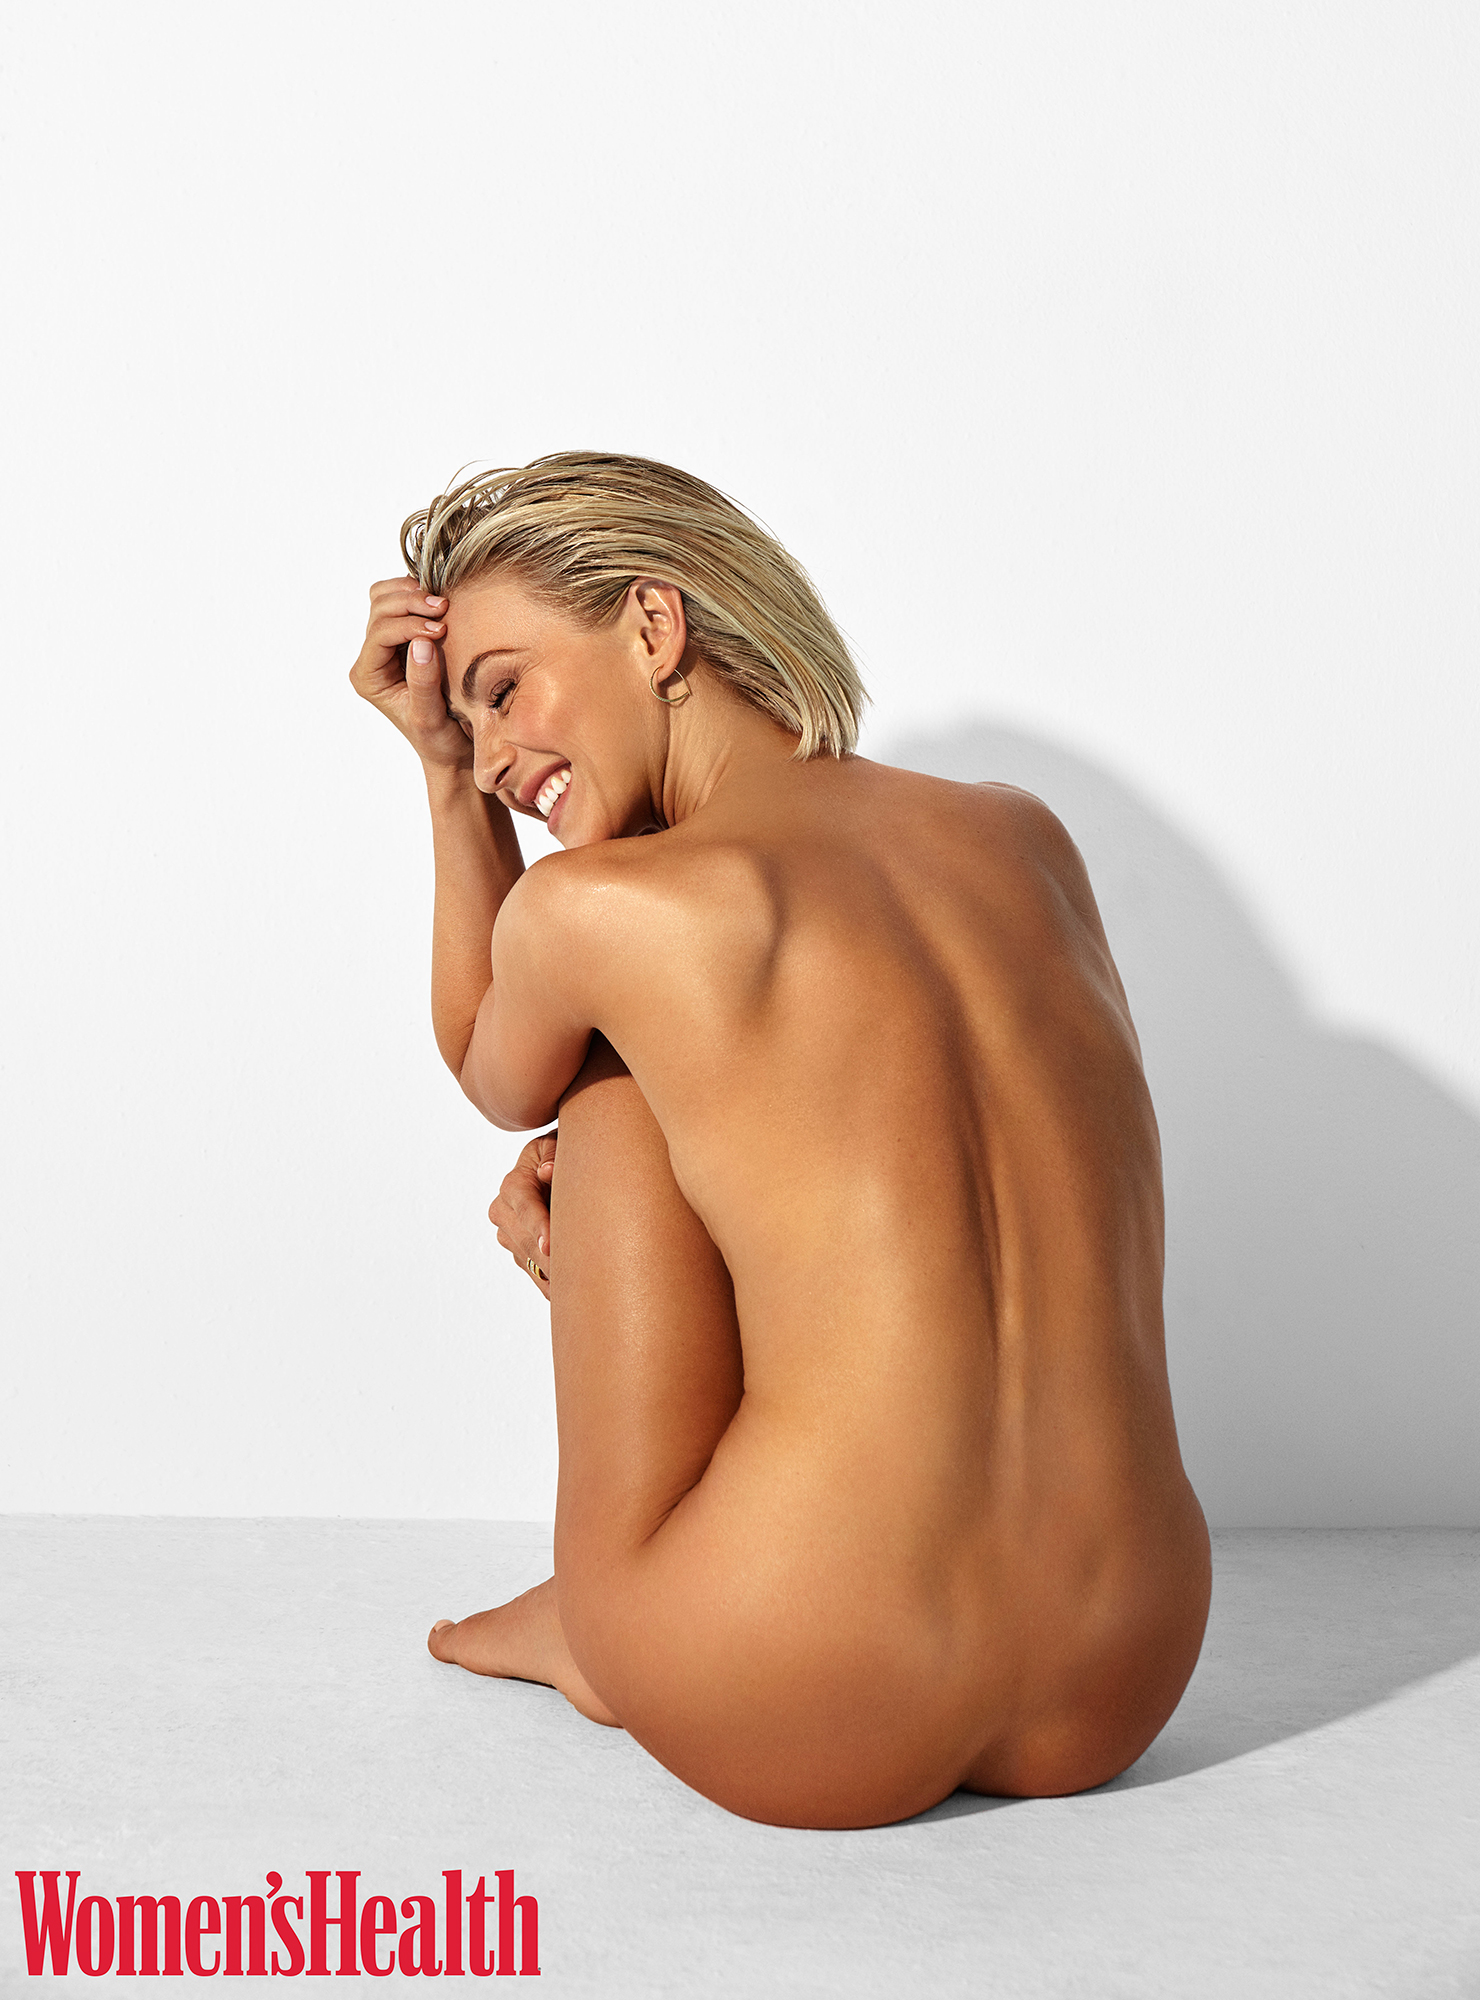 American idol reality tv stars nude